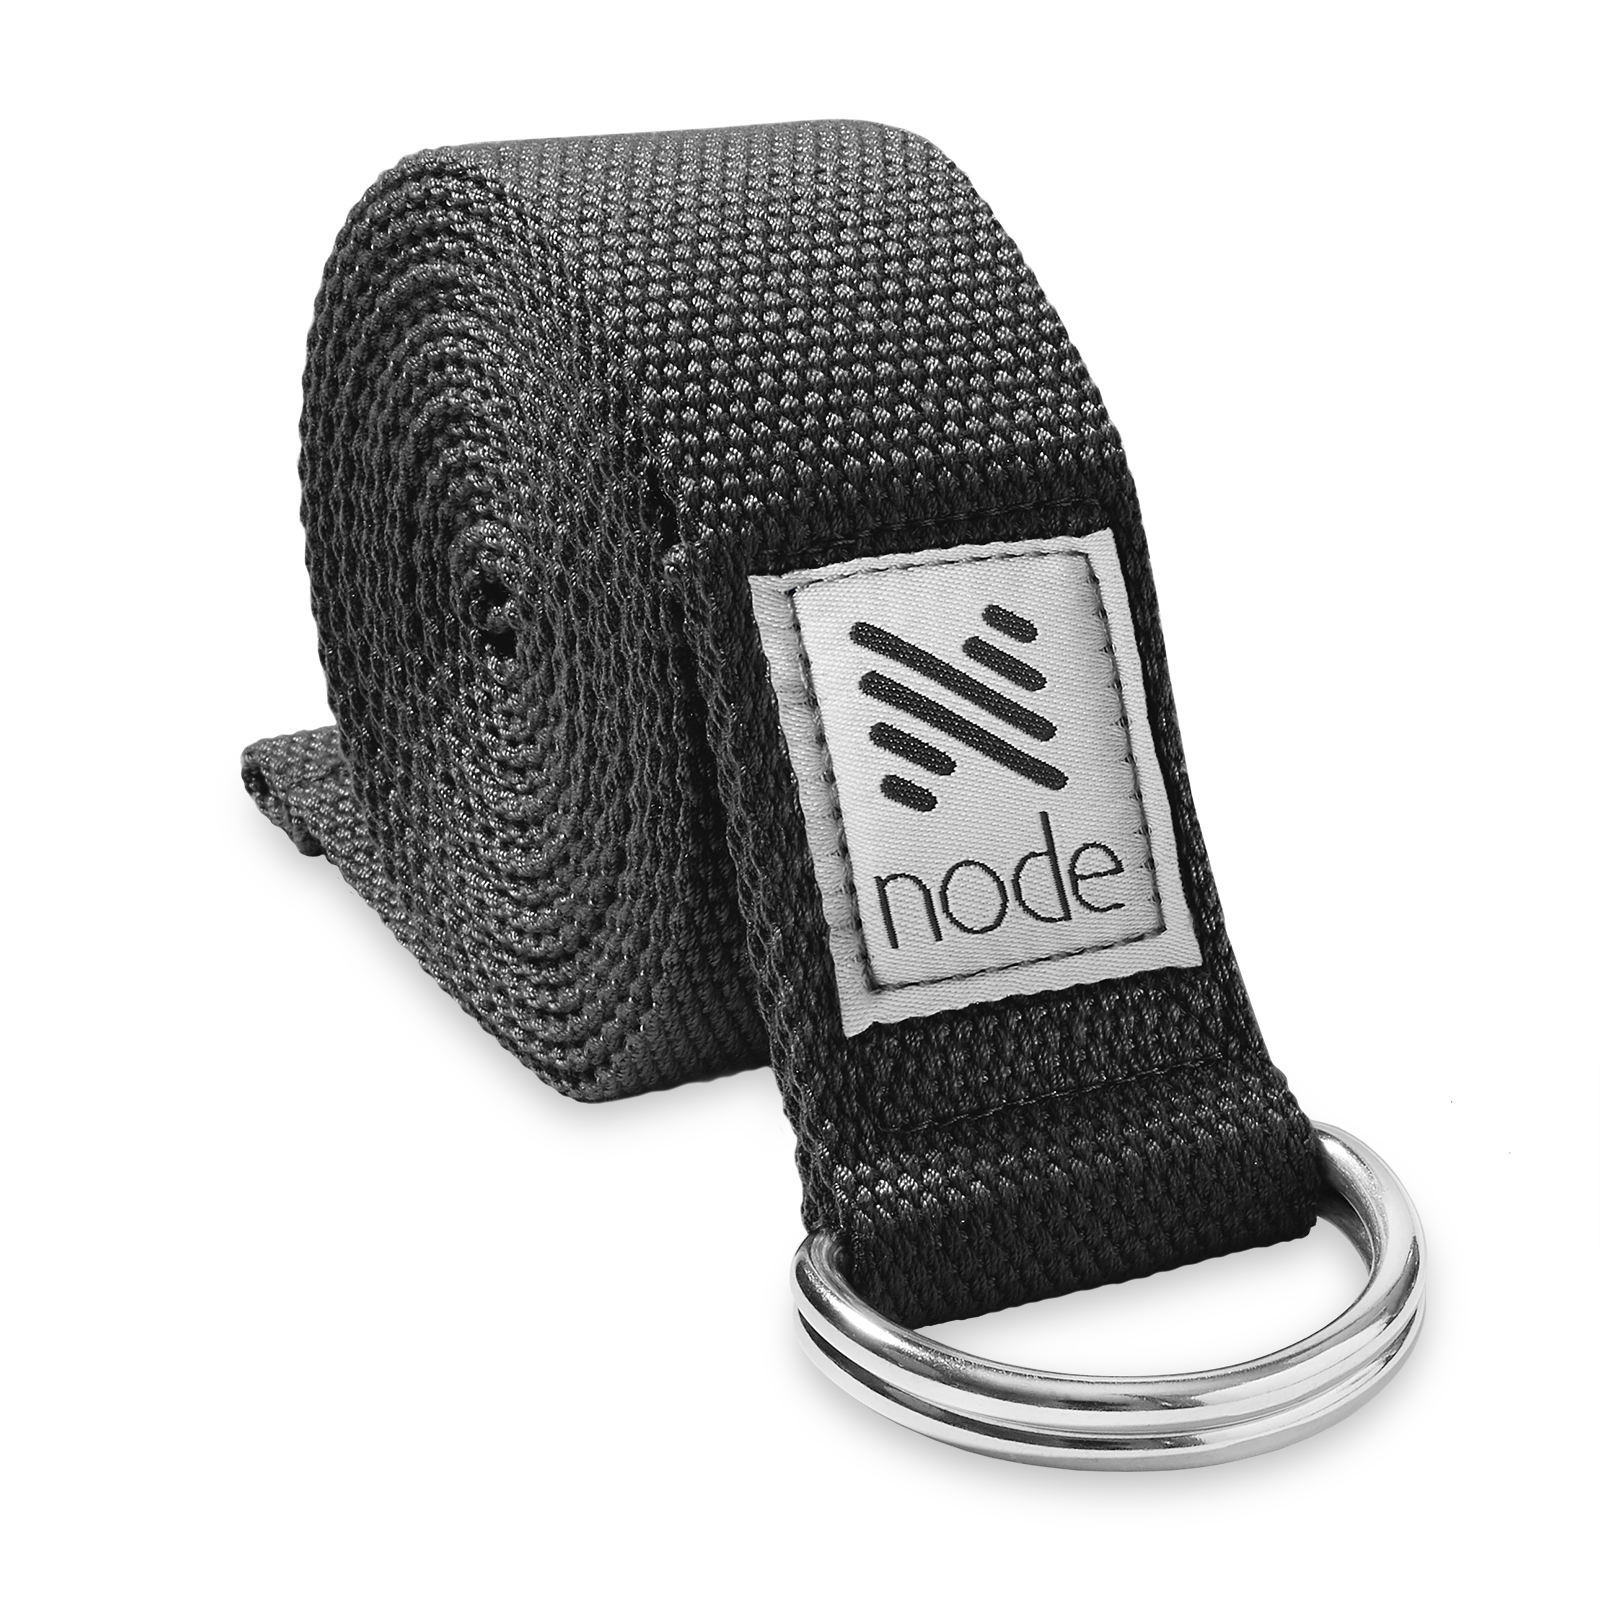 7-1-2-039-Woven-Cotton-Blend-Yoga-Strap-Stretching-Exercise-Prop-Belt thumbnail 3